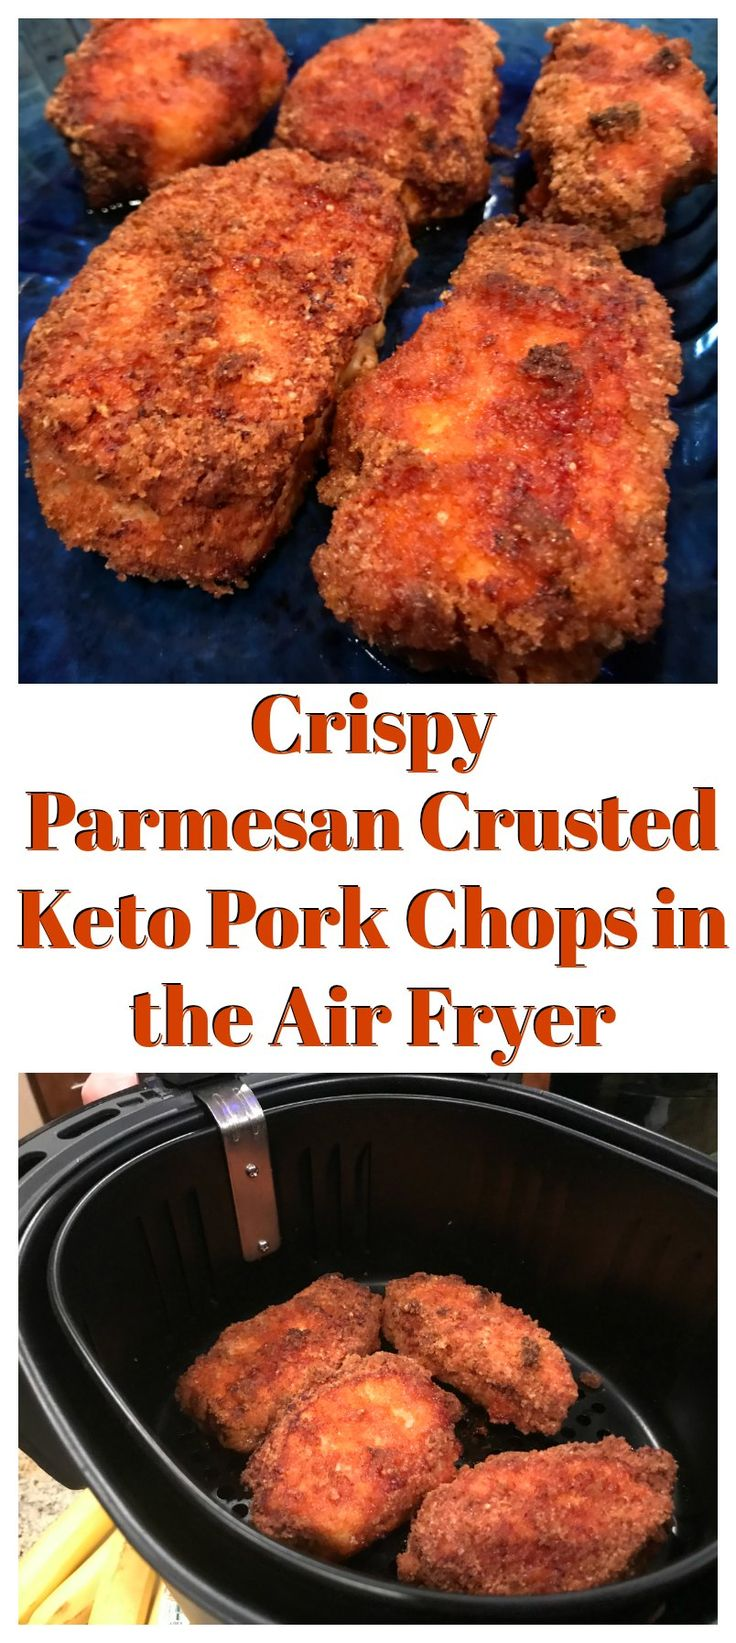 Keto Pork Chops Crispy and Delicious via @isavea2z